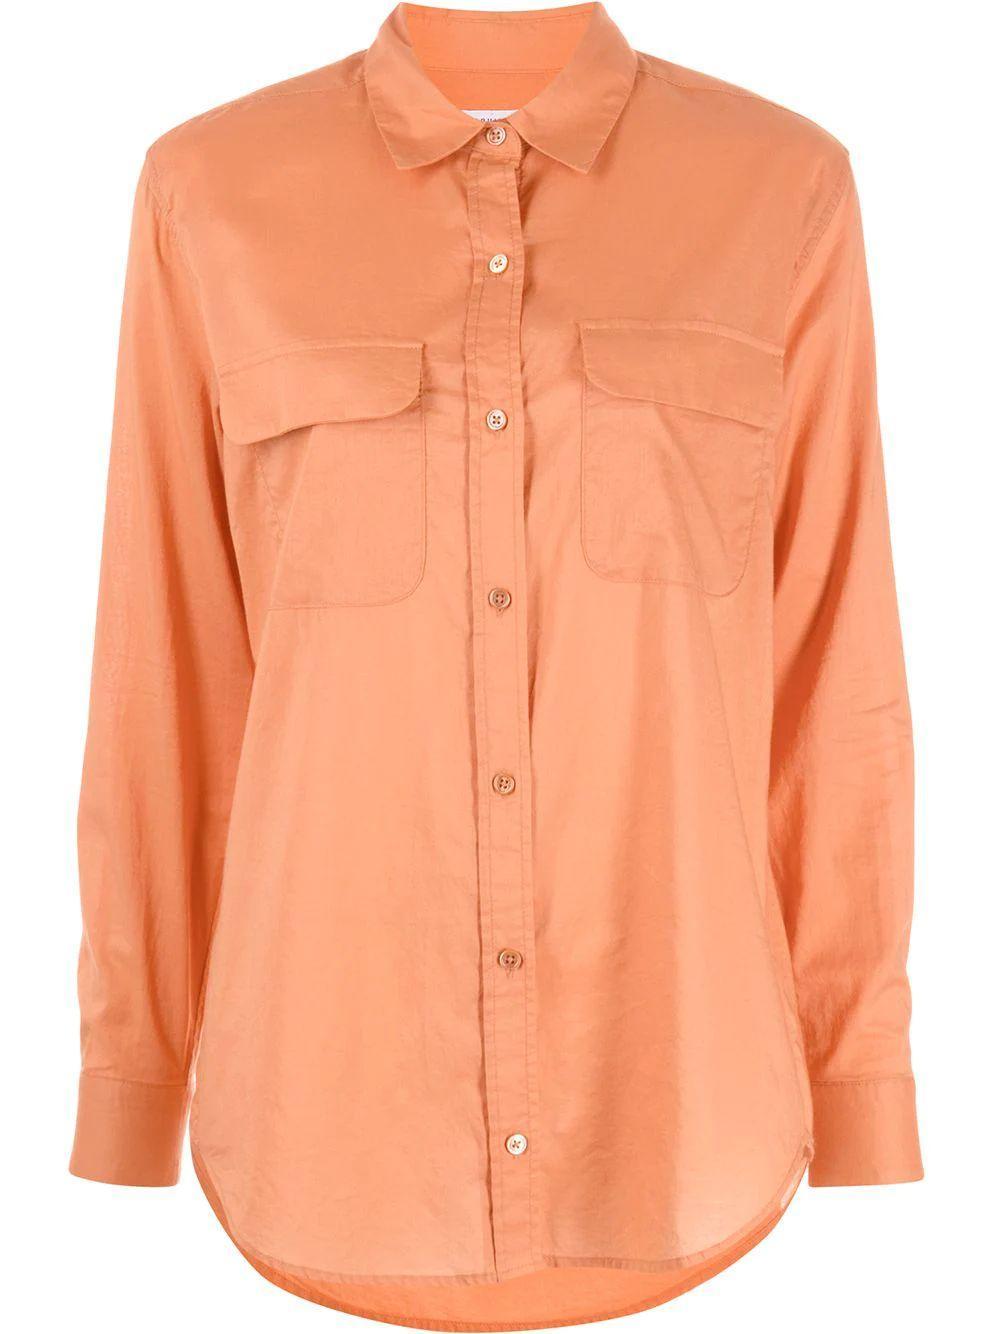 Signature Button Down Shirt Item # 21-1-008414-E035